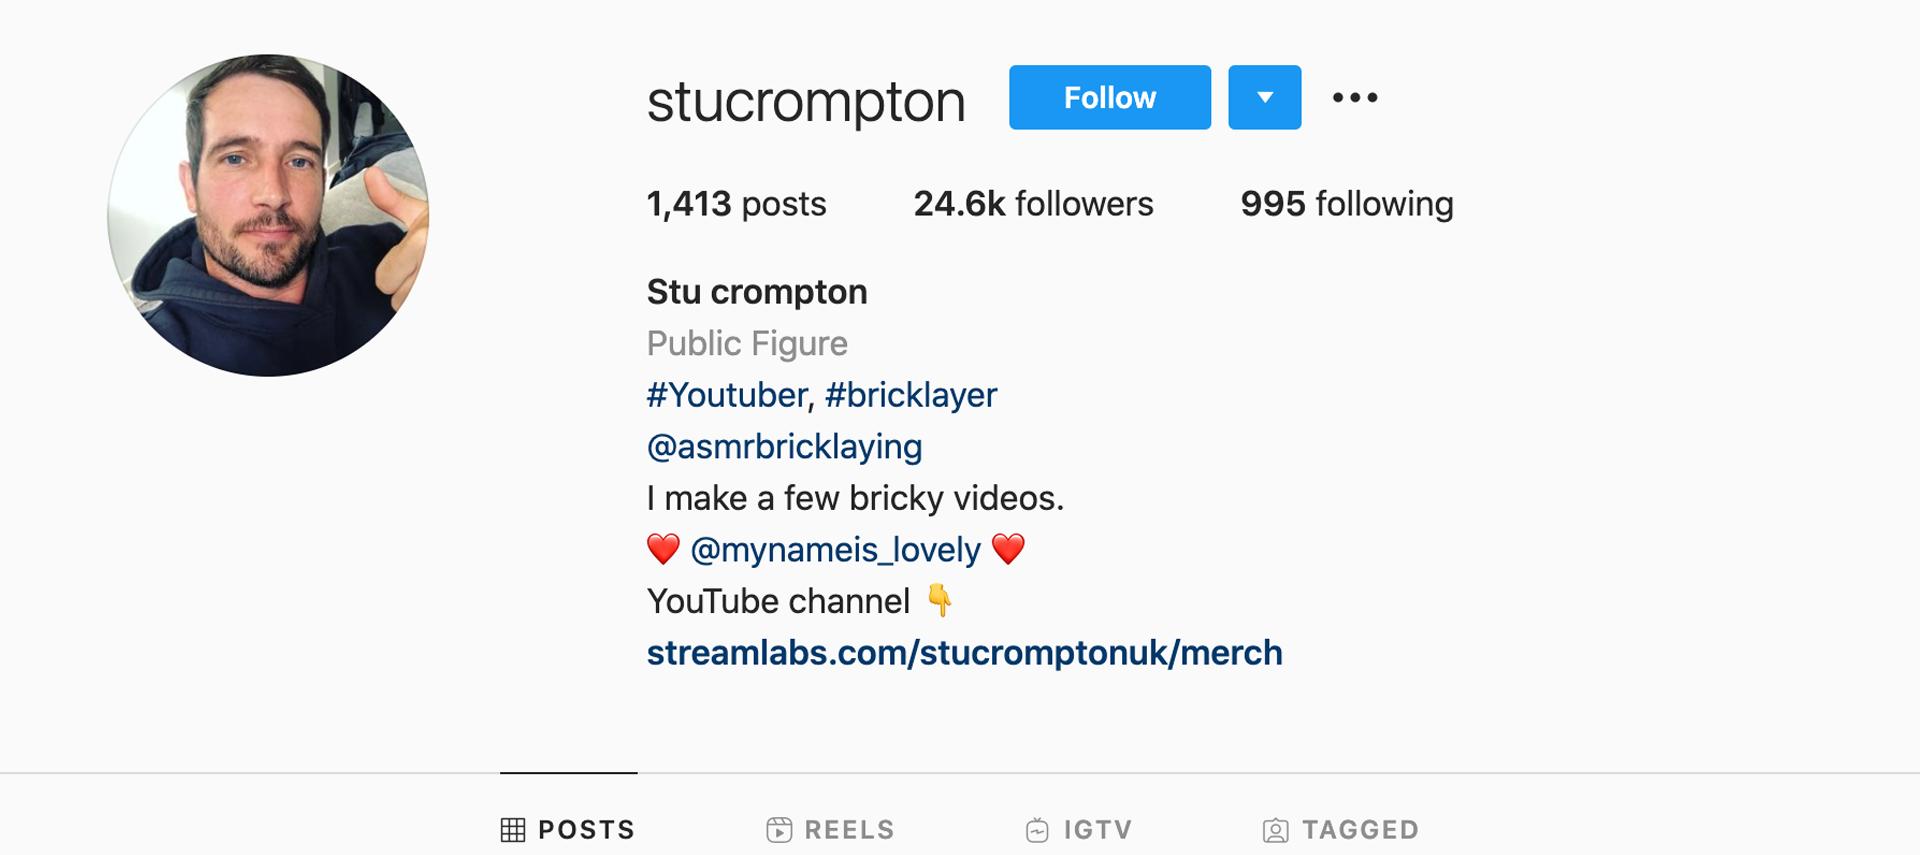 stu-crompton-instagram-profile